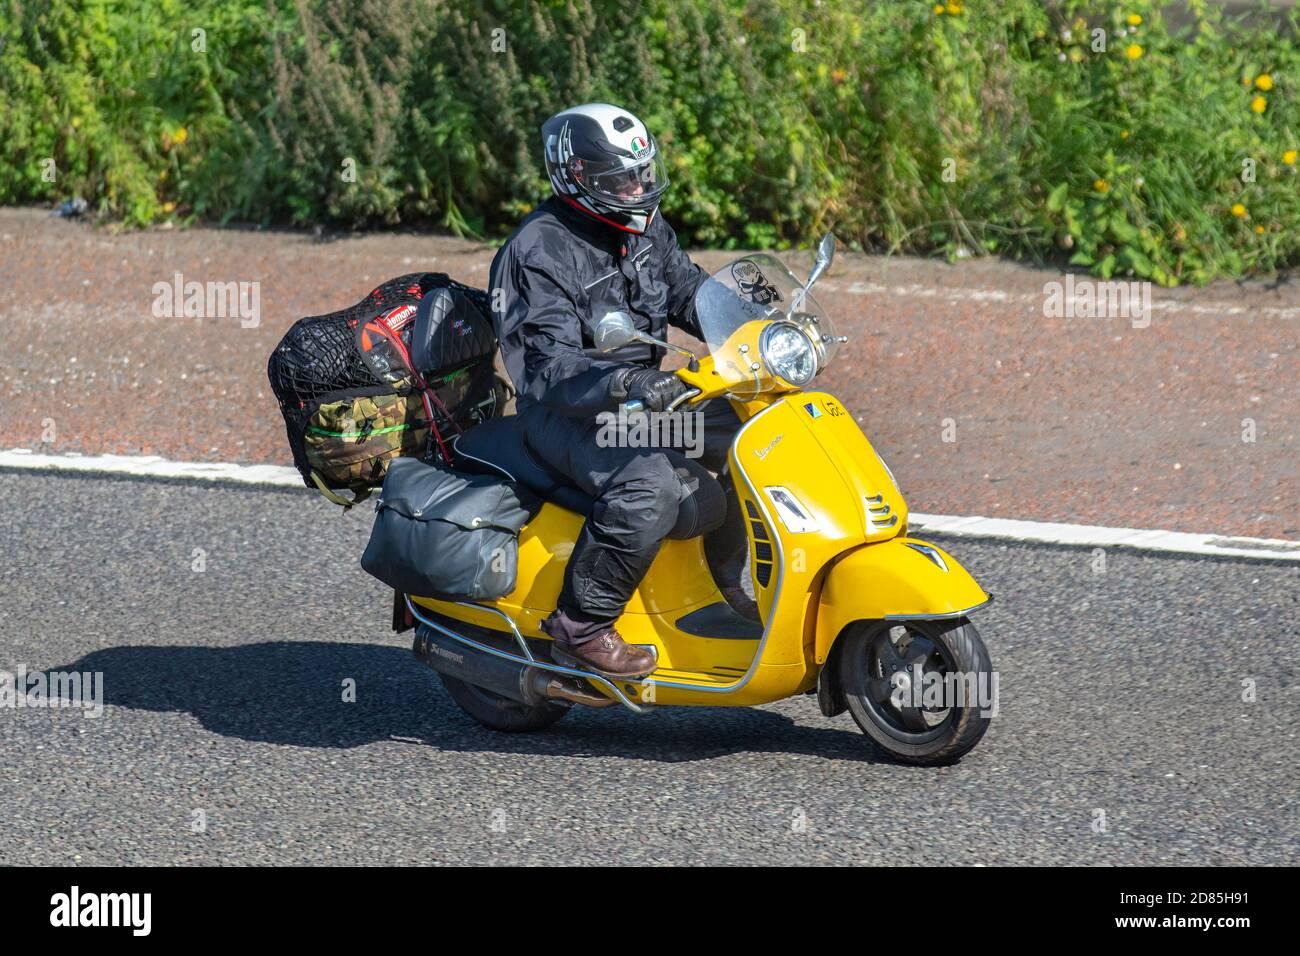 Yellow Vespa Scooter Rider Two Wheeled Transport Motorcycles Vehicle Roads Motorbikes Bike Riders Motoring In Chorley Uk Stock Photo Alamy